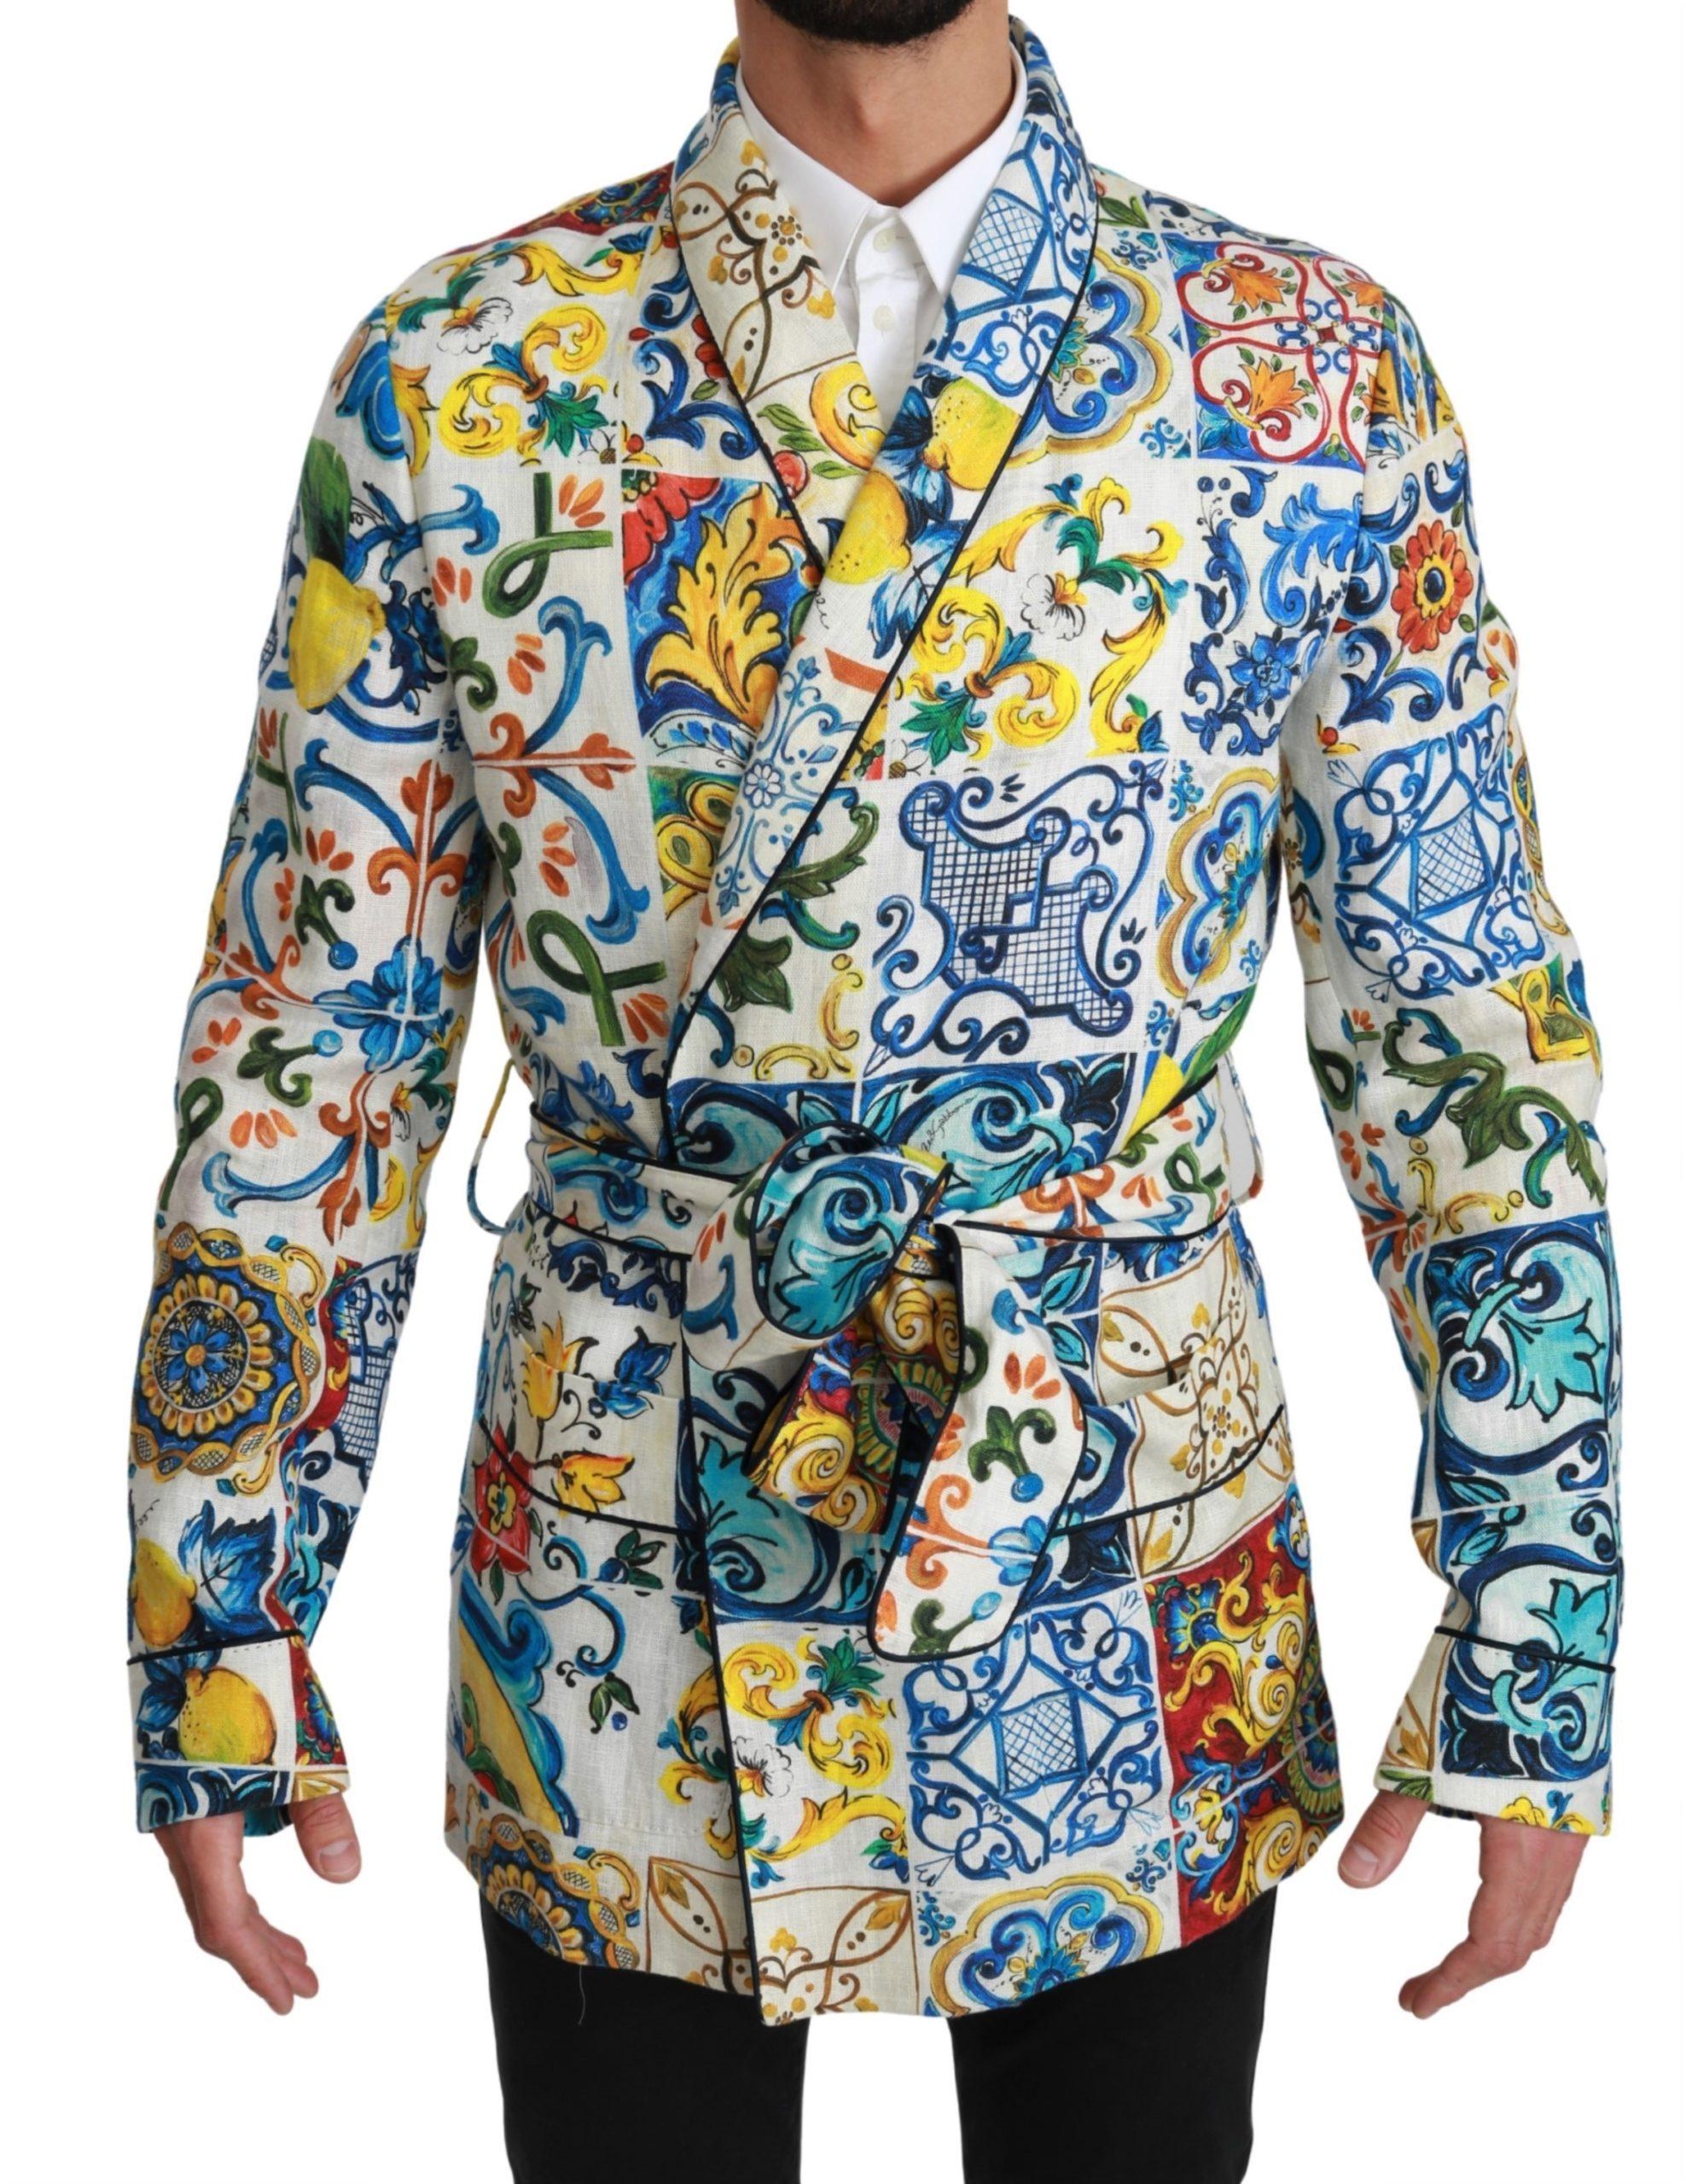 Dolce & Gabbana Men's Brocade Linen Robe Jacket Multicolor JKT2598 - IT46 | S